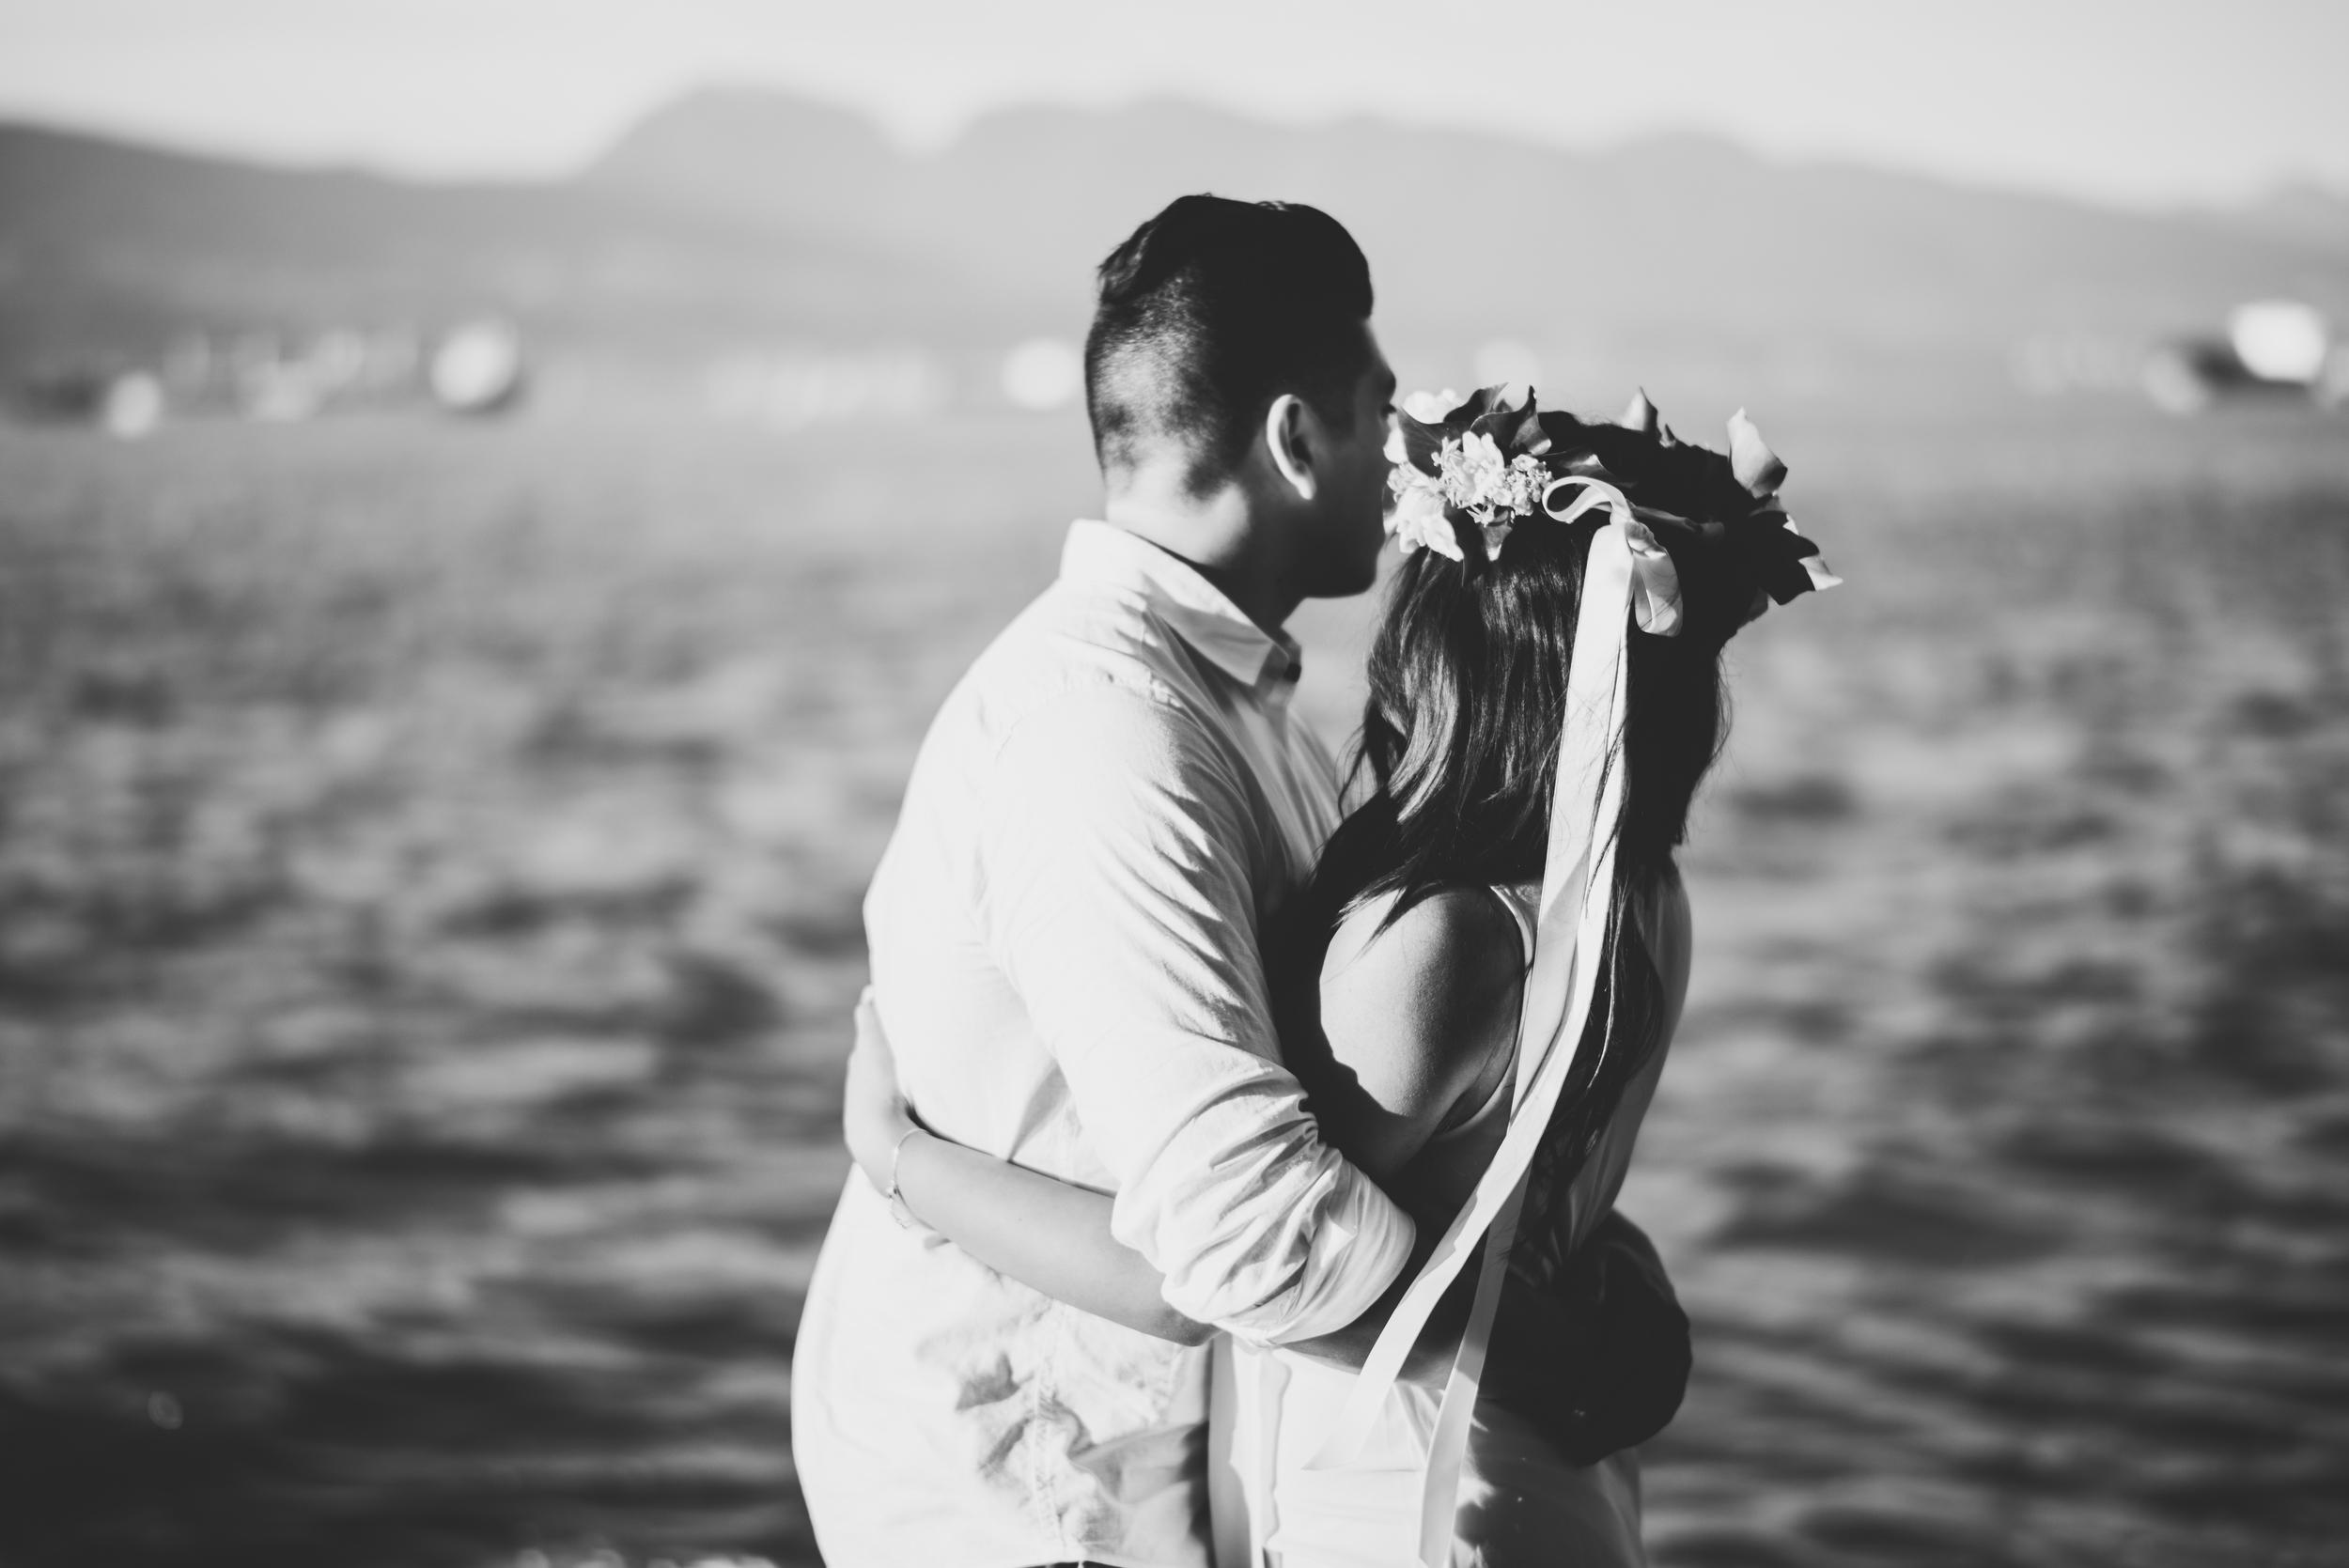 Ricardo & Stephanie - Engagement - © Dallas Kolotylo Photography - 78.jpg